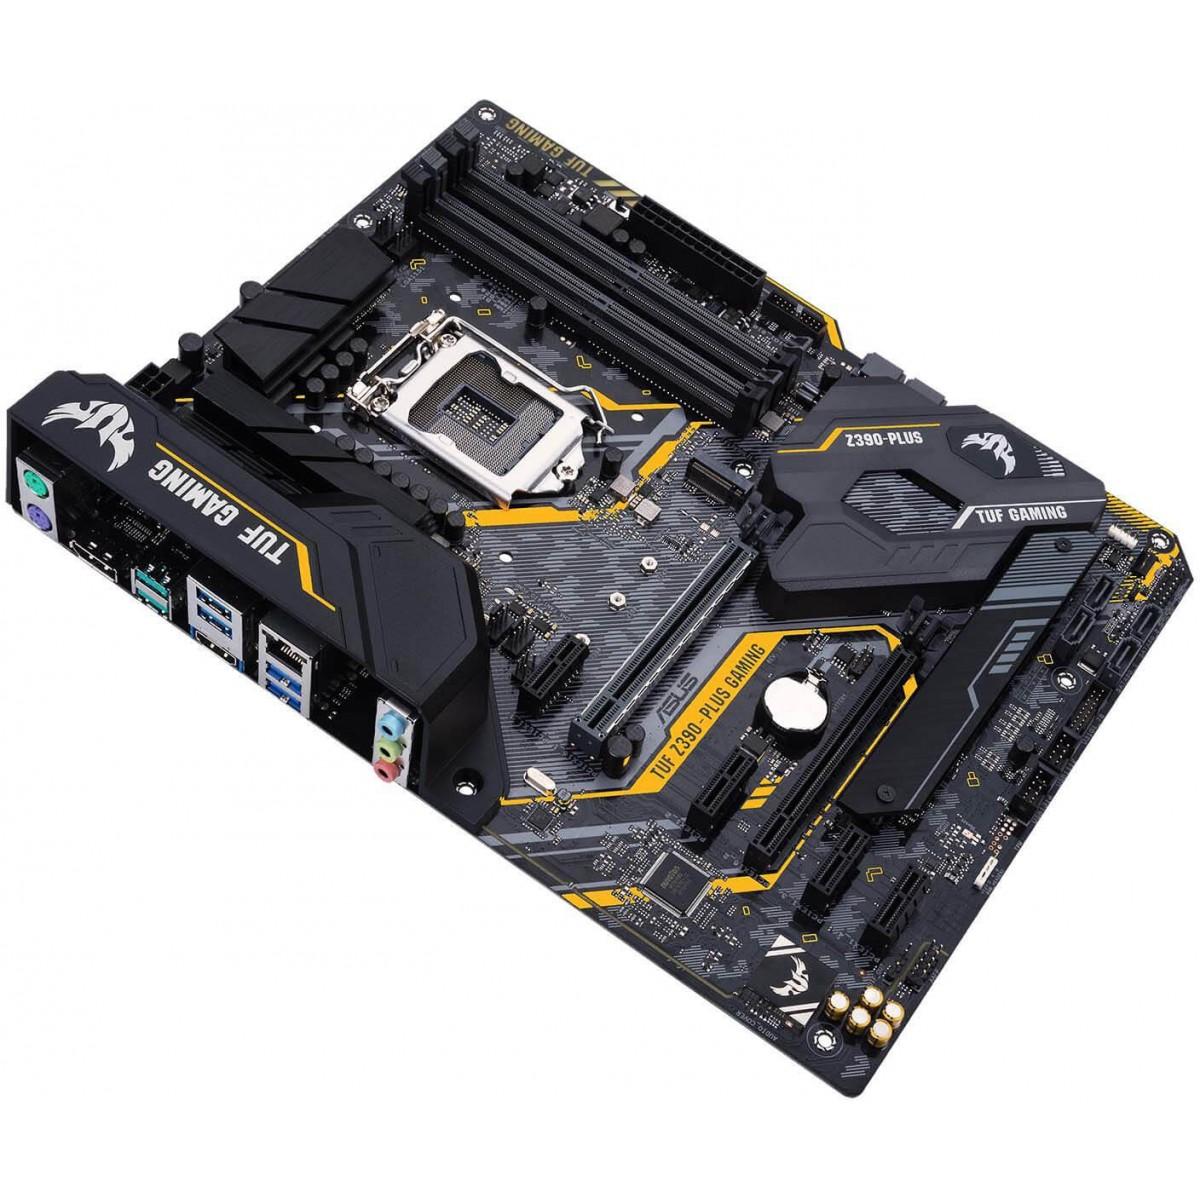 Placa Mãe Asus TUF Z390-Plus Gaming, Chipset Z390, Intel LGA 1151, ATX, DDR4